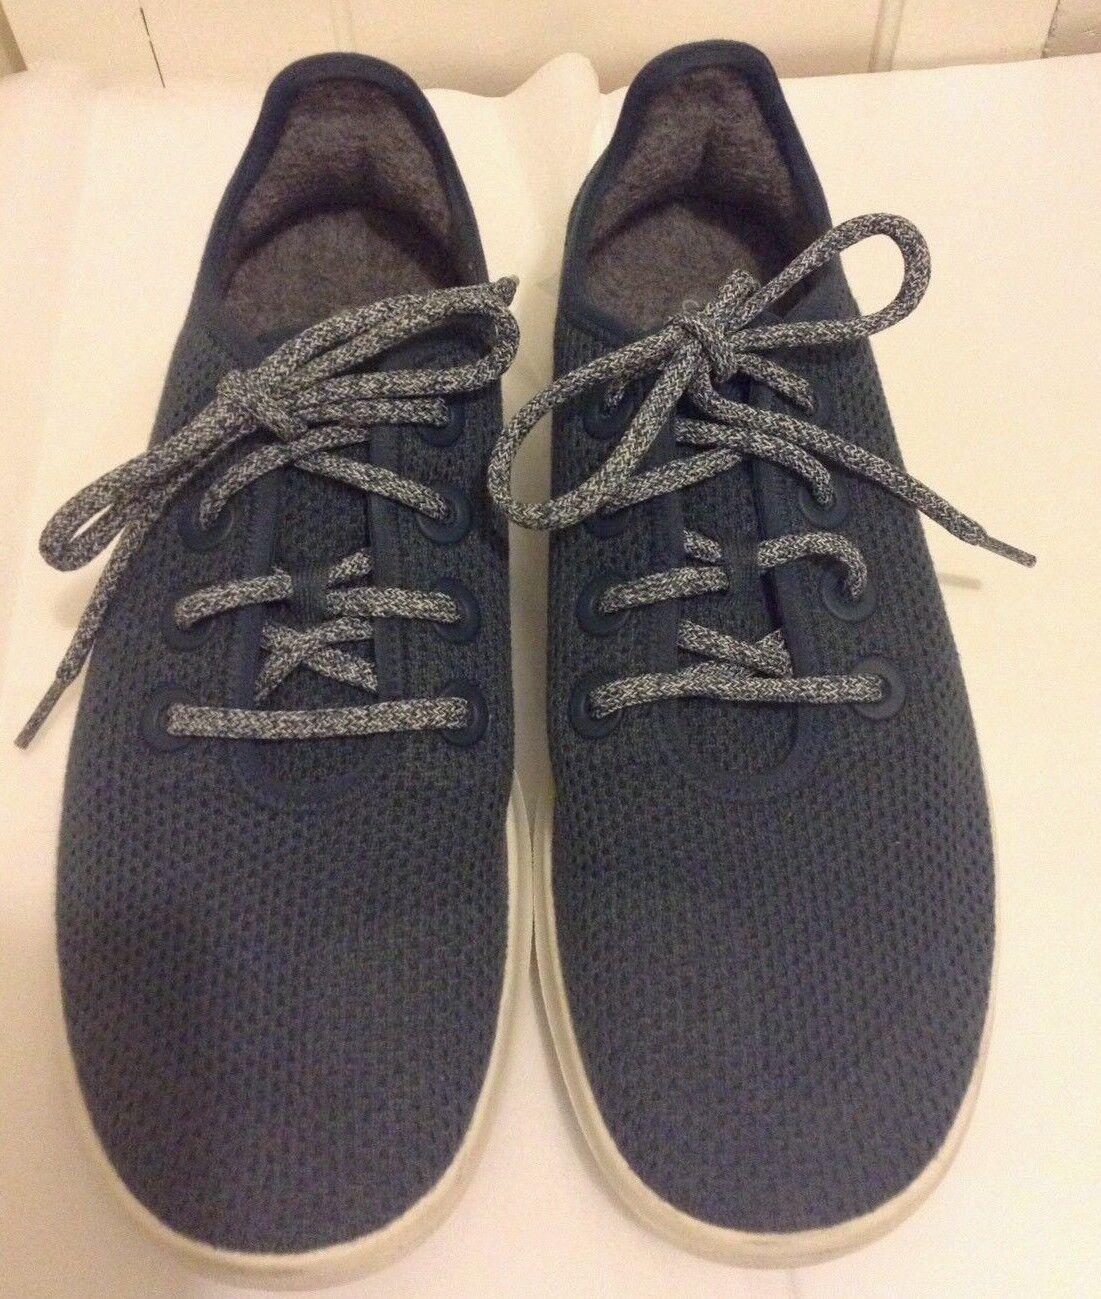 Allbirds Allbirds Allbirds Mesh Tree Runner shoes Sneakers Sz 10 Navy bluee wool insole eco made cc4f15